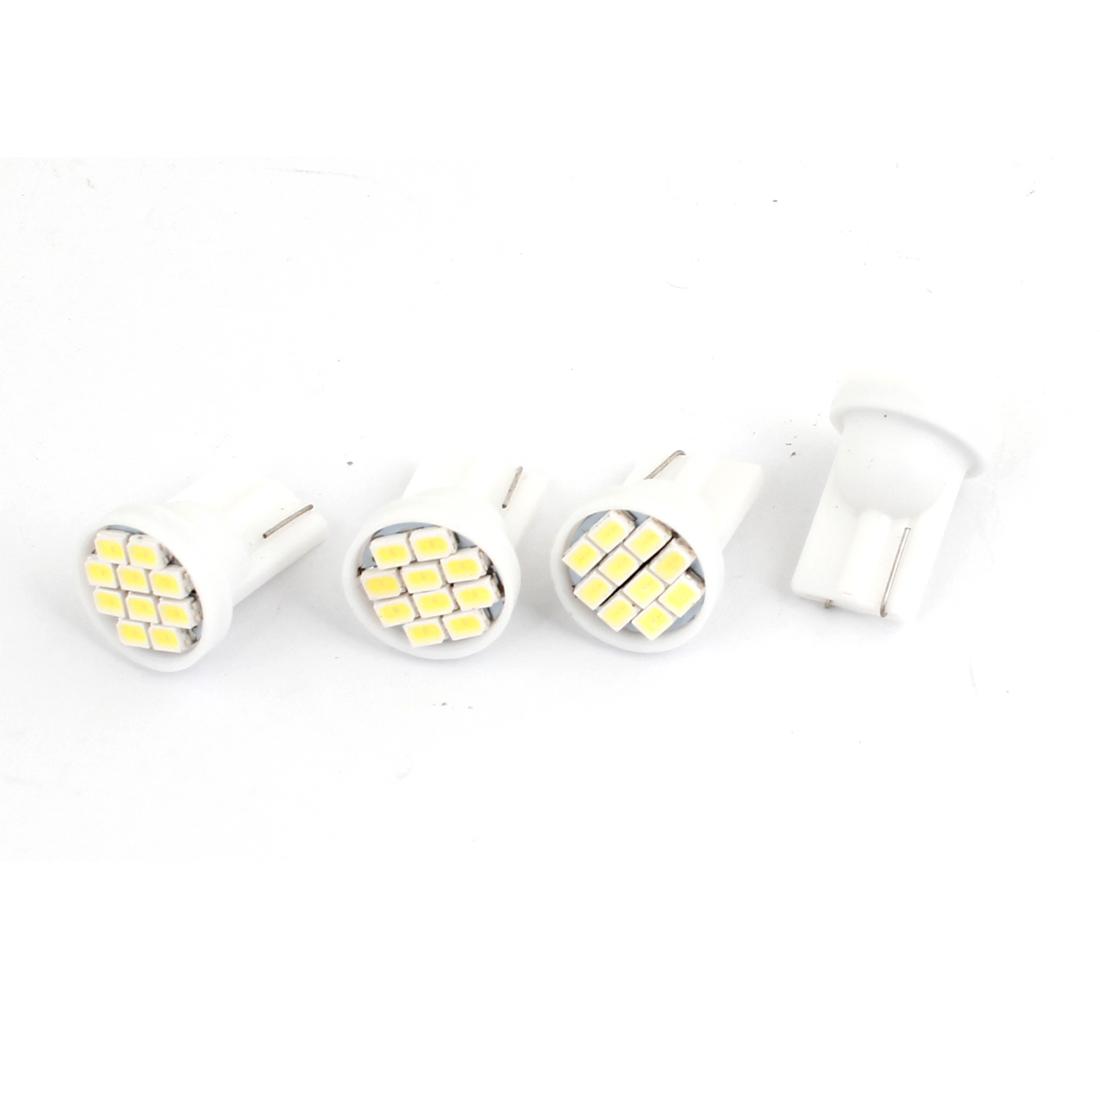 4pcs T10 White 10 LED 1206 SMD Dashboard Gauge Light Bulb for Car